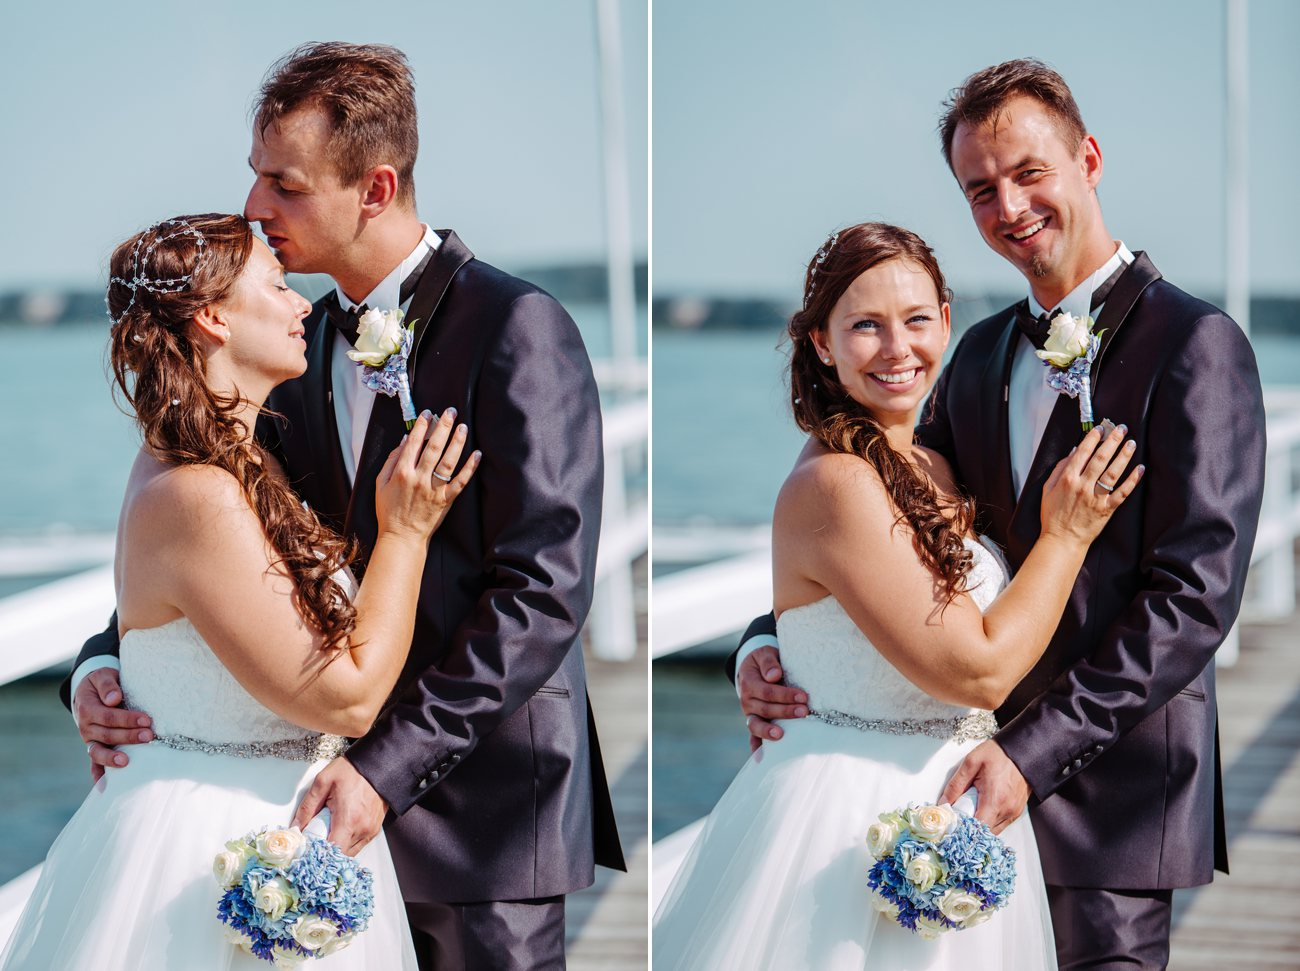 Hochzeitsfotograf_A-Rosa_Scharmuetzelsee074